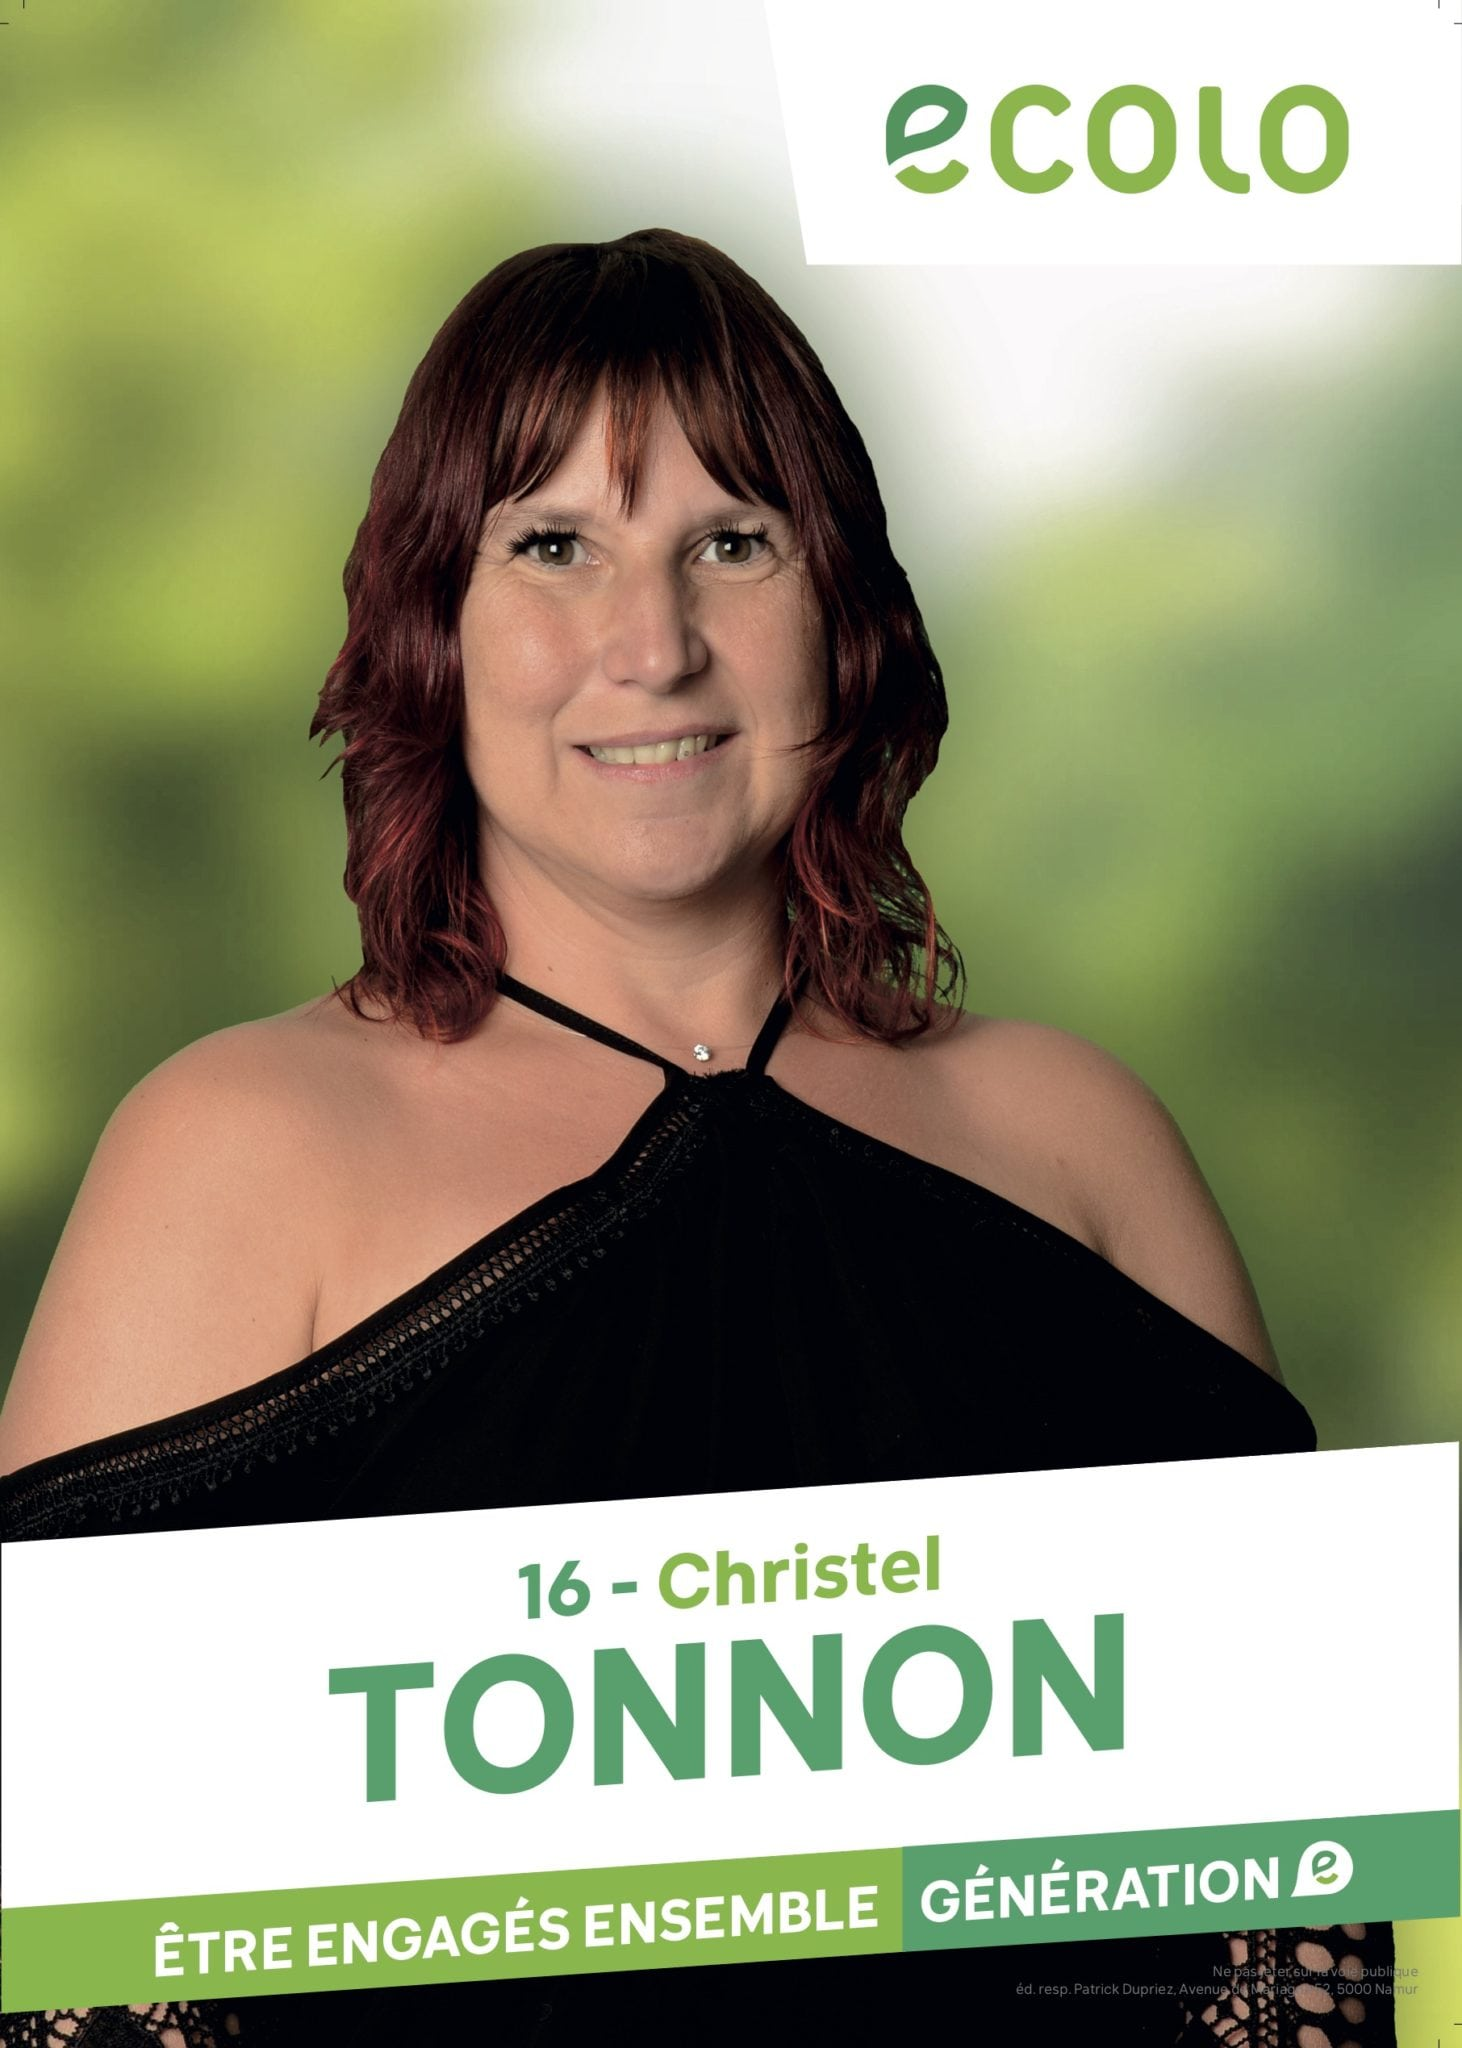 Christel Tonnon